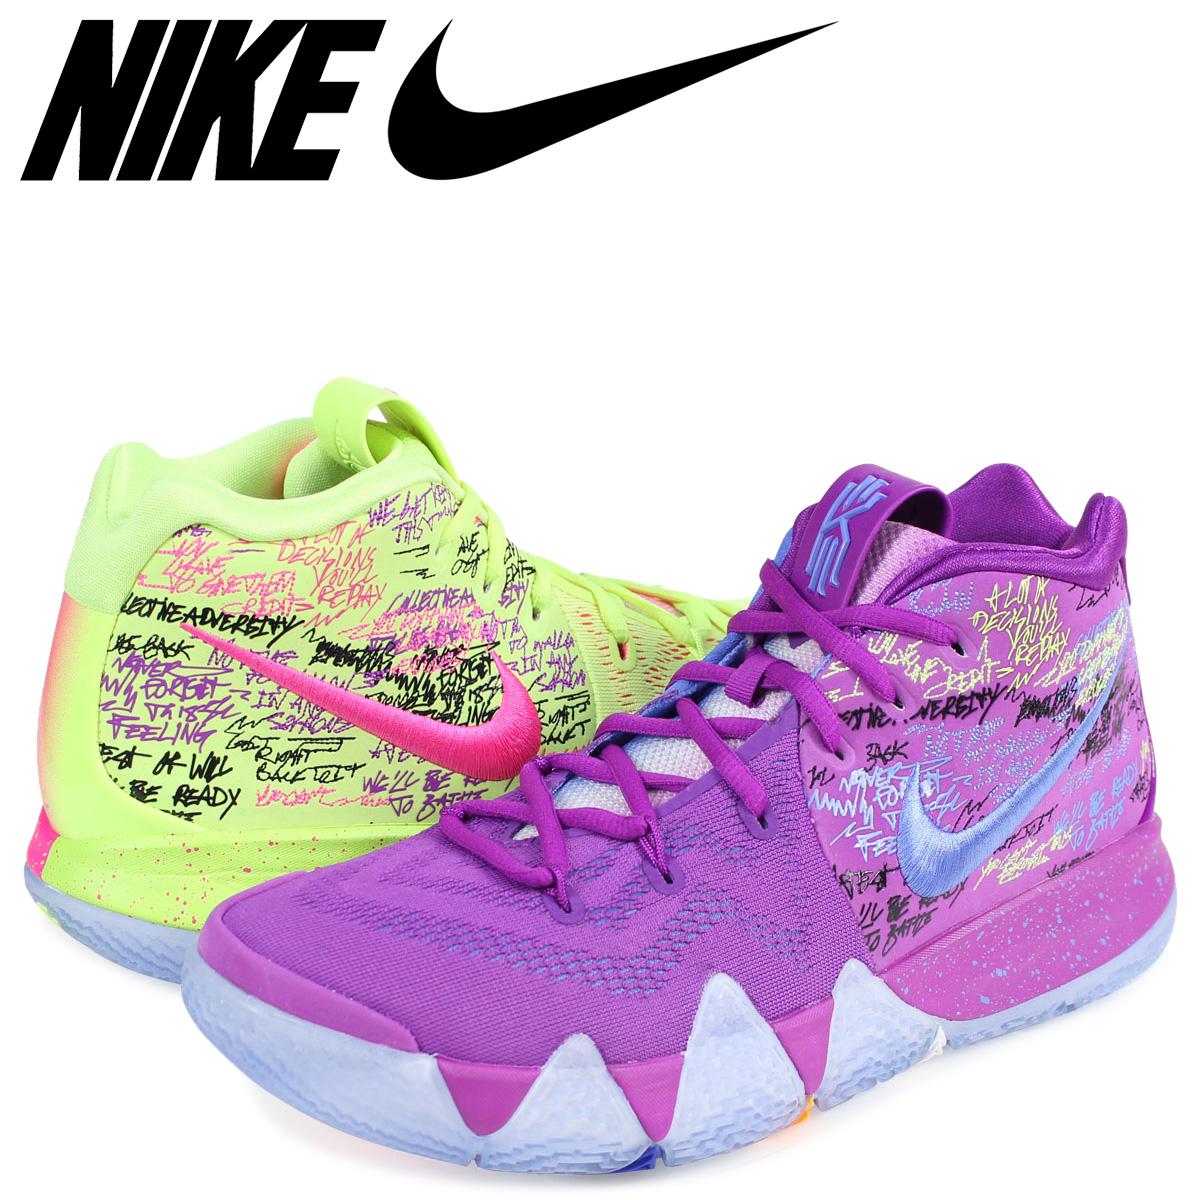 daf654a7f40 hot nike kyrie 4 ep confetti nike chi lee 4 sneakers men aj1691 900 0ba75  f8b13